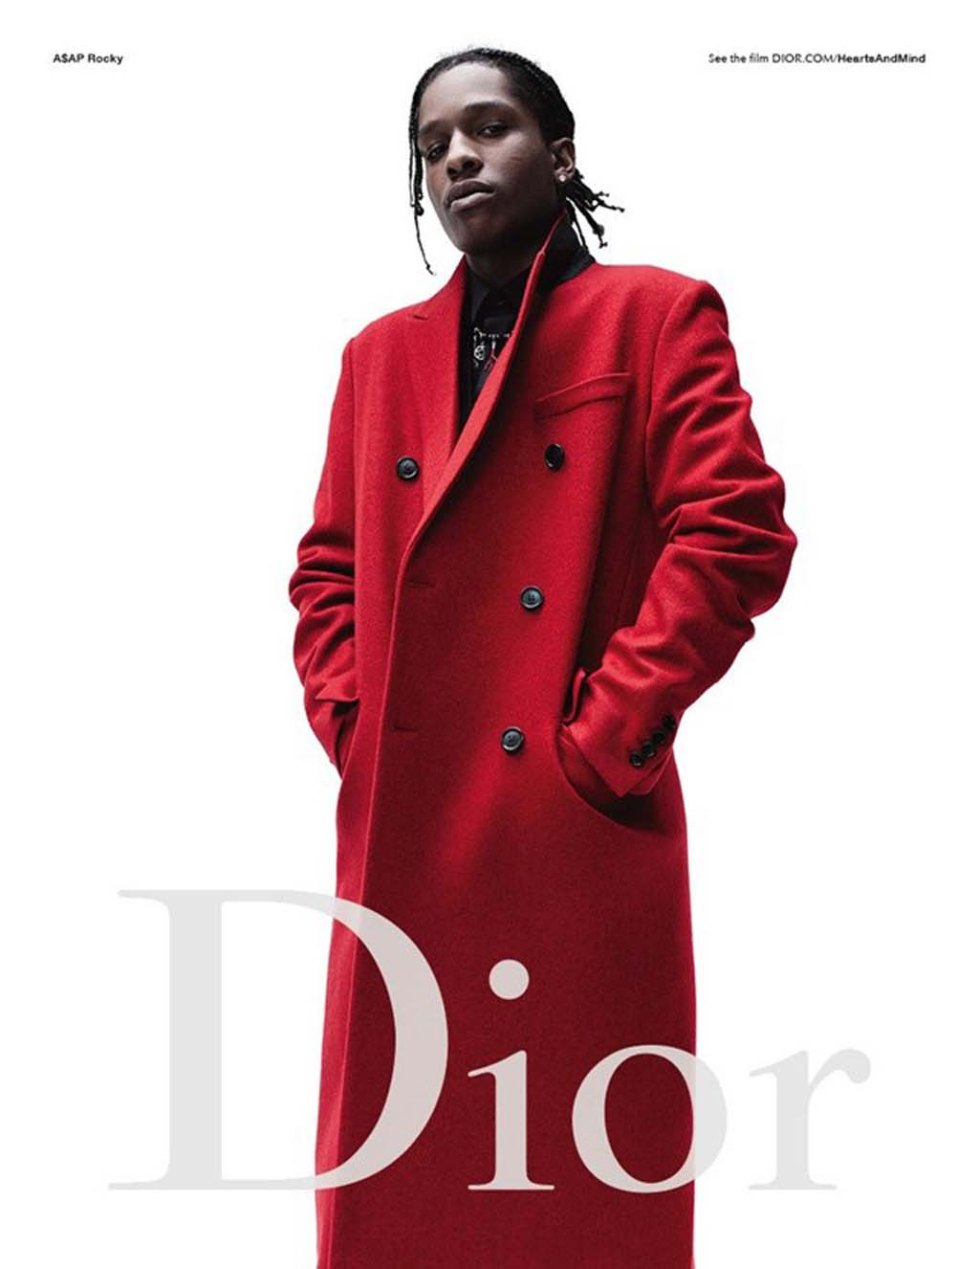 Dior-Homme-aw16-campaign-slashitmag-fashion-ad-5